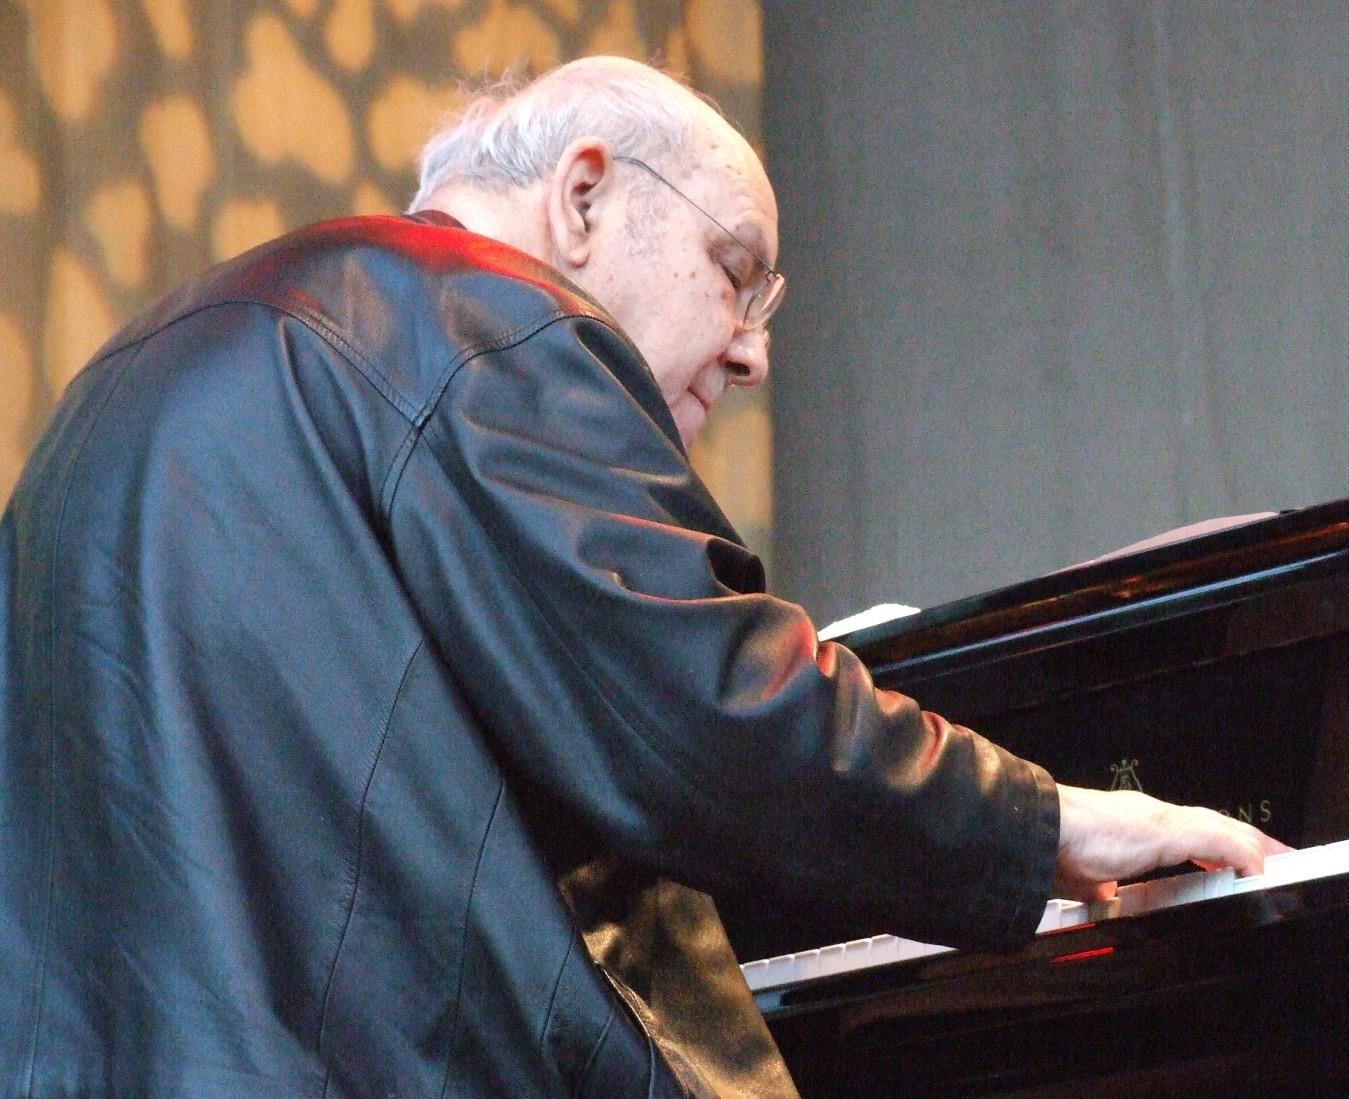 2008 Chicago Jazz Festival, Sunday: Misha Mengelberg, Venerable Co-Leader of the Equally Venerable Dutch ICP Orchestra